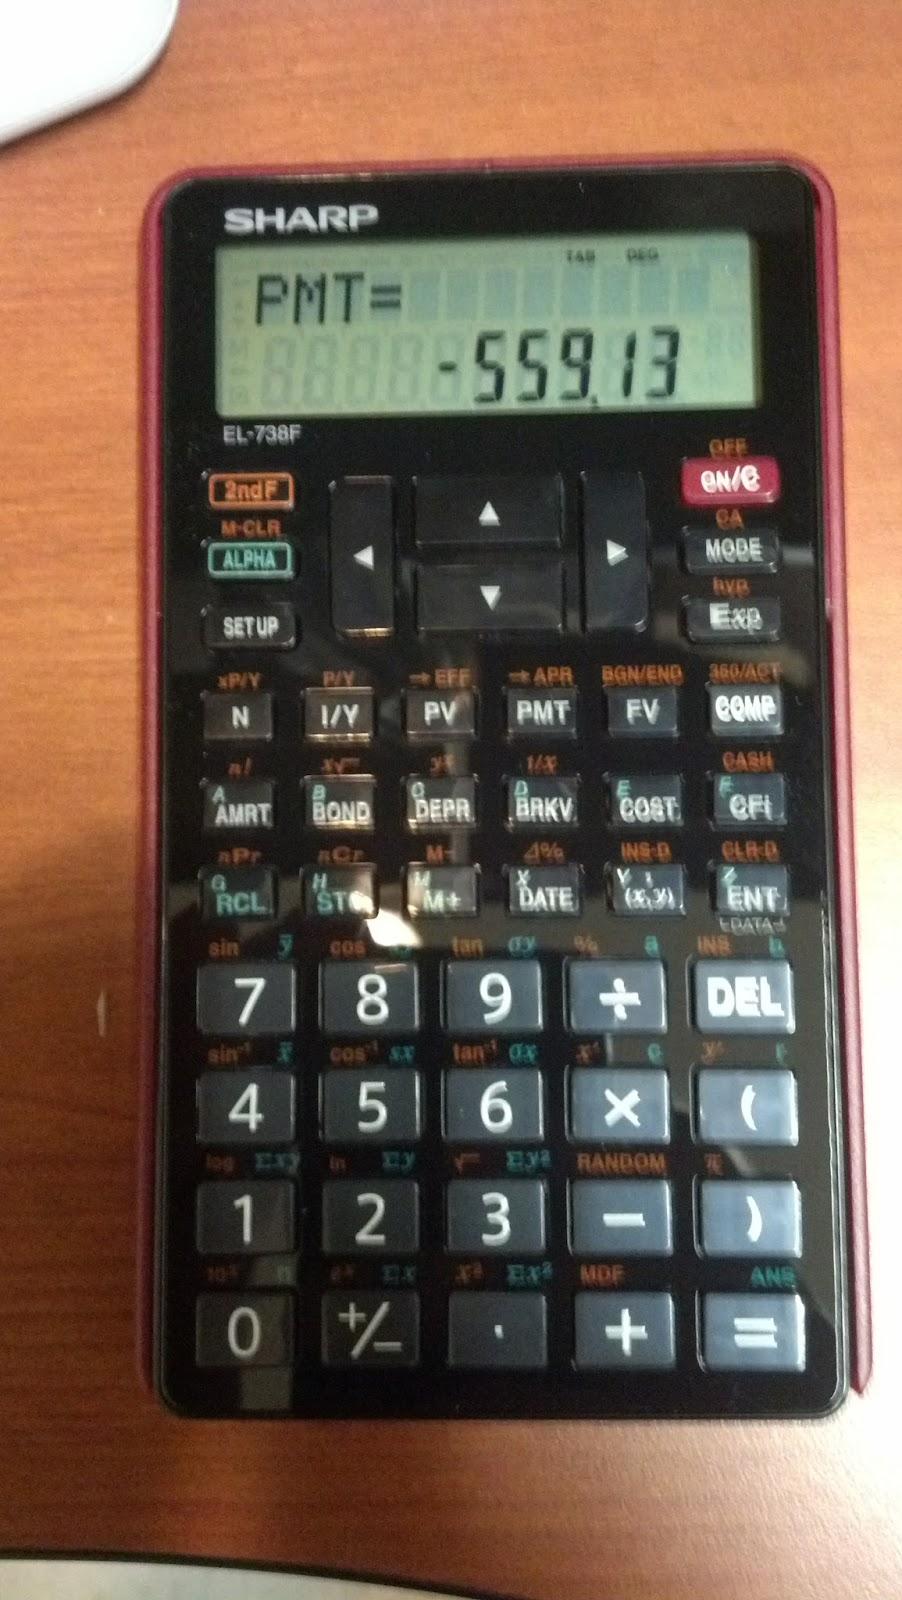 Eddie's Math and Calculator Blog: Review: Sharp EL-738F